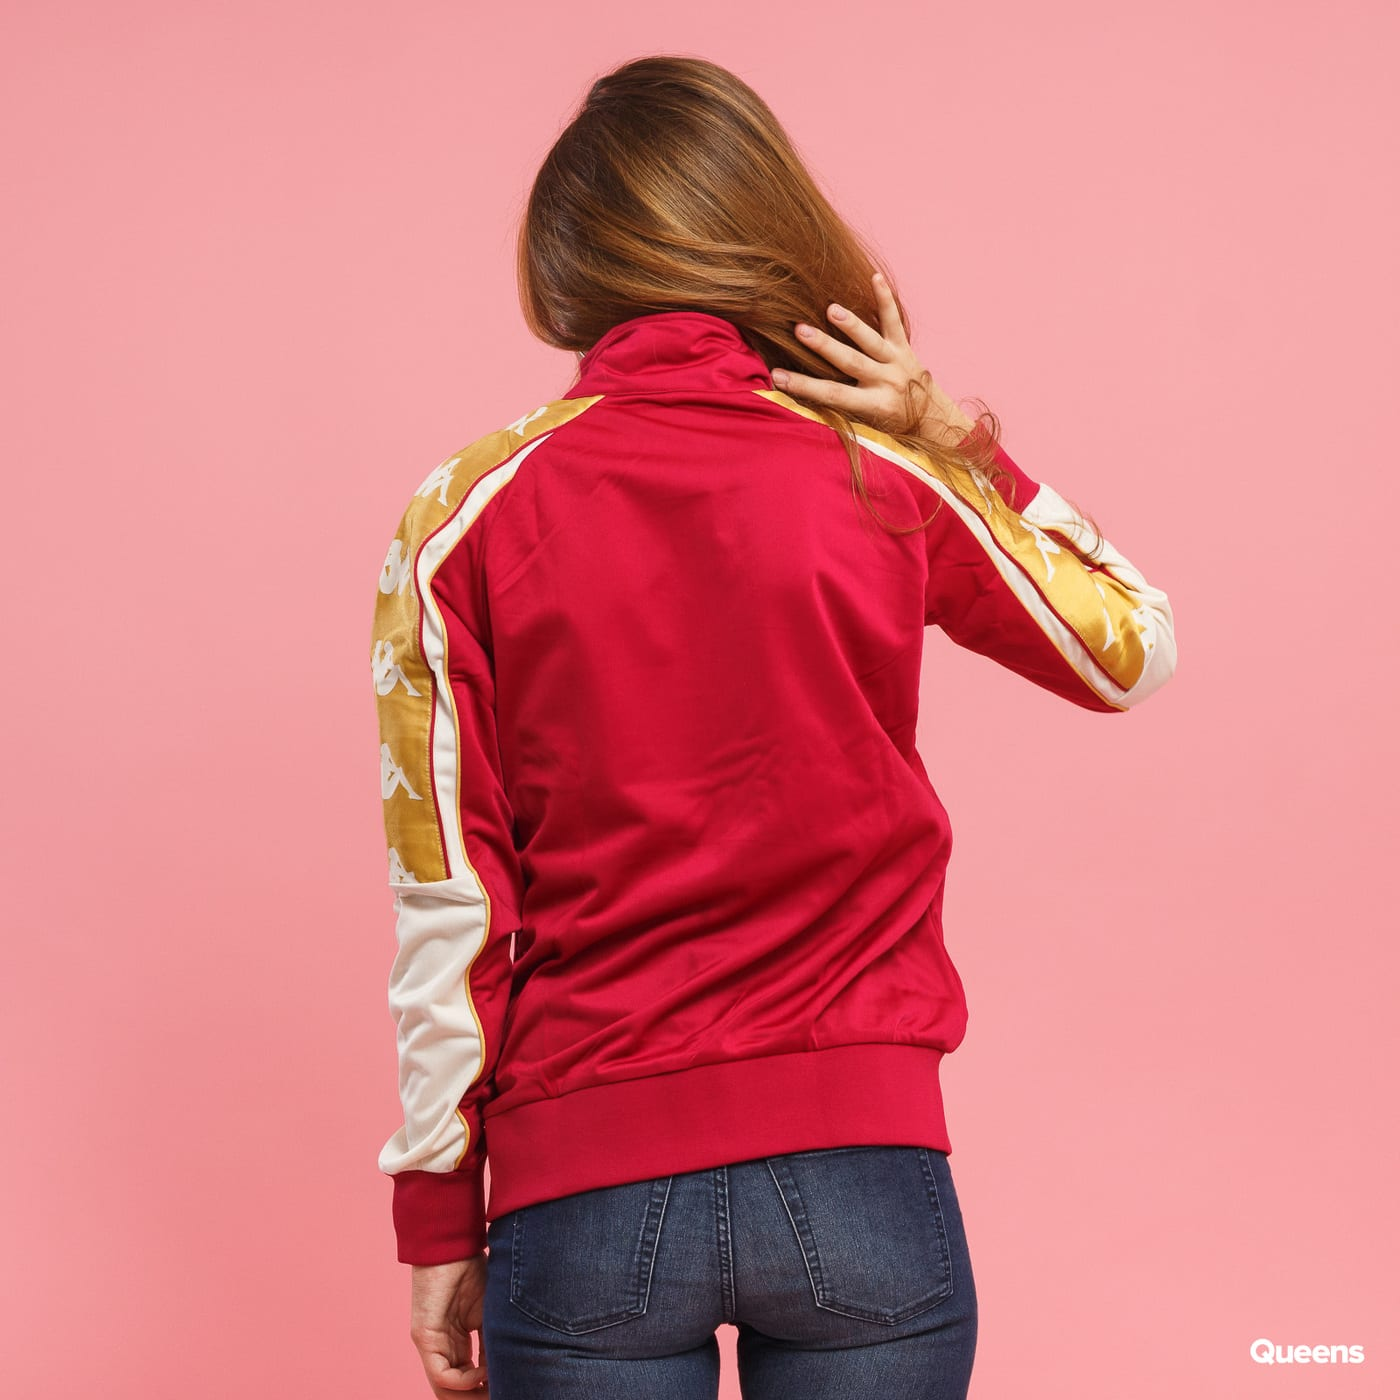 Kappa Banda 10 Anay tmavoružová / zlatá